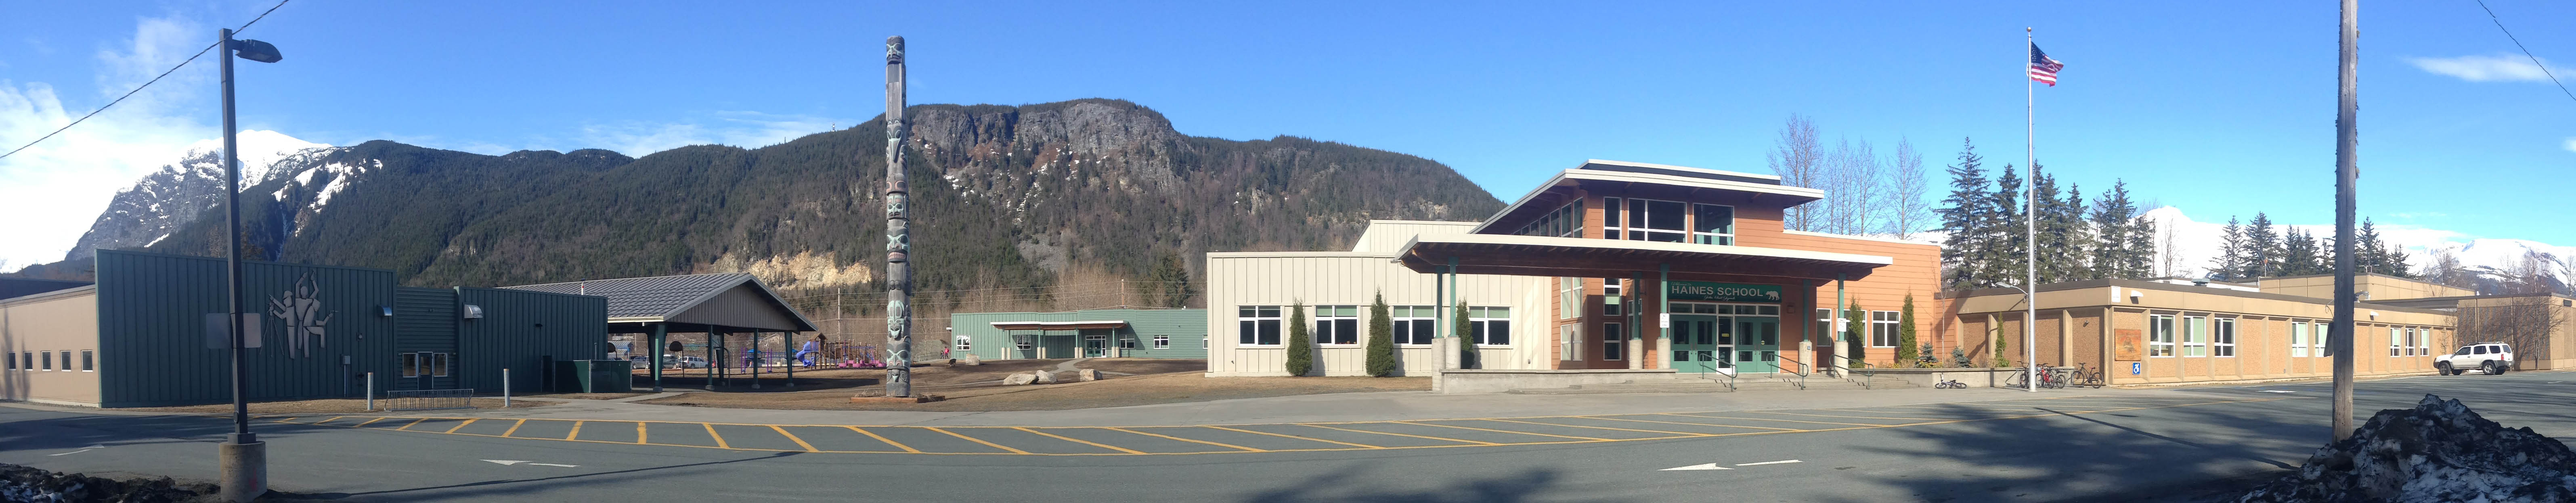 Elementary School Panorama